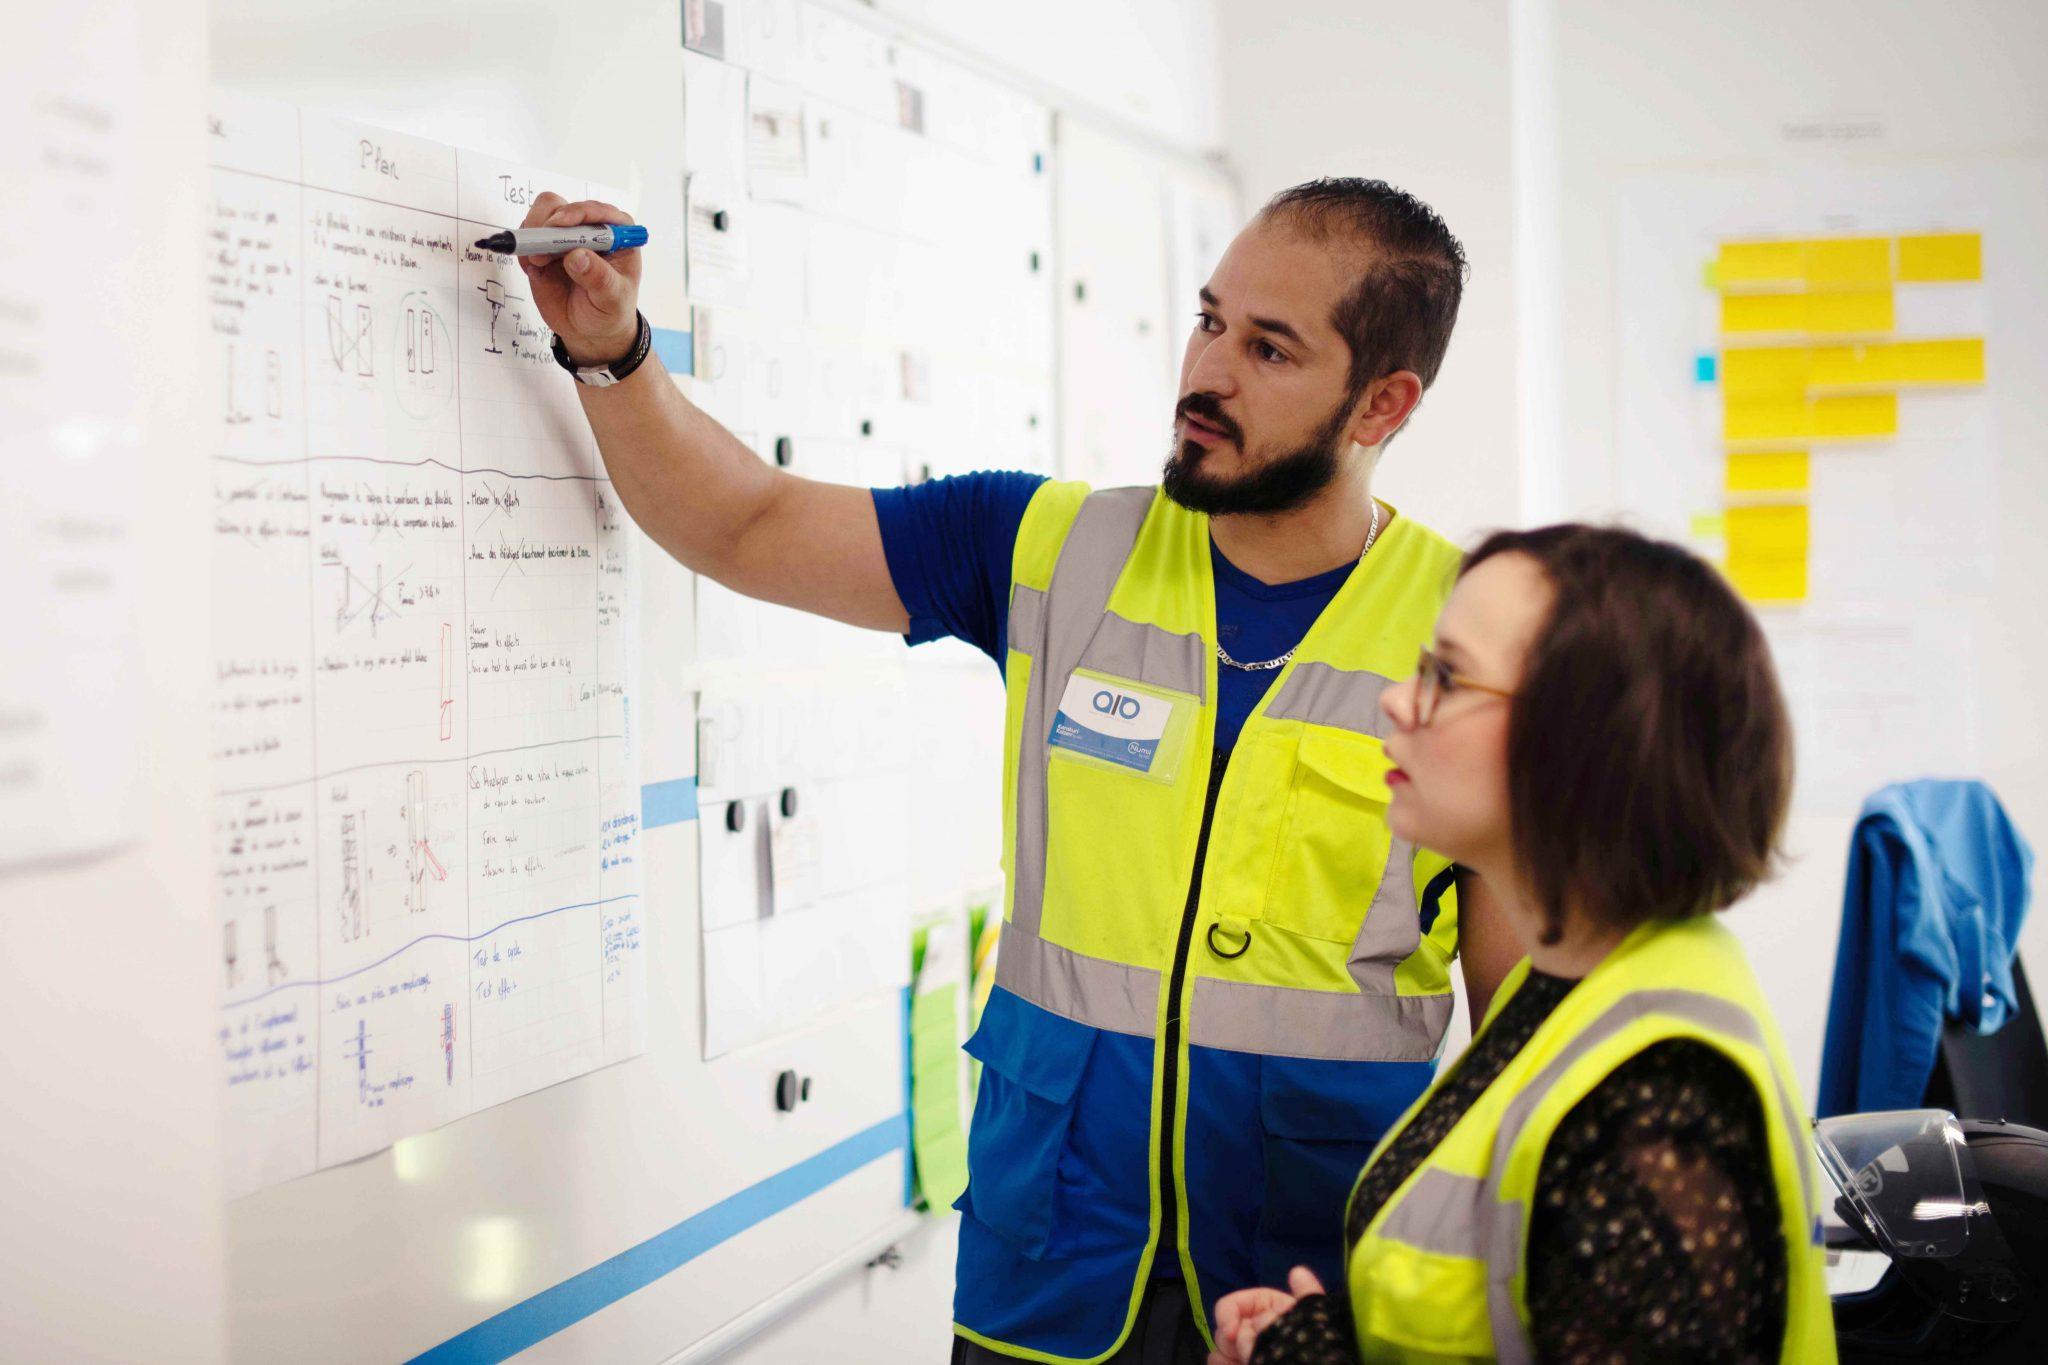 Engineer and technicien observing diagrams Karakuri Kaizen